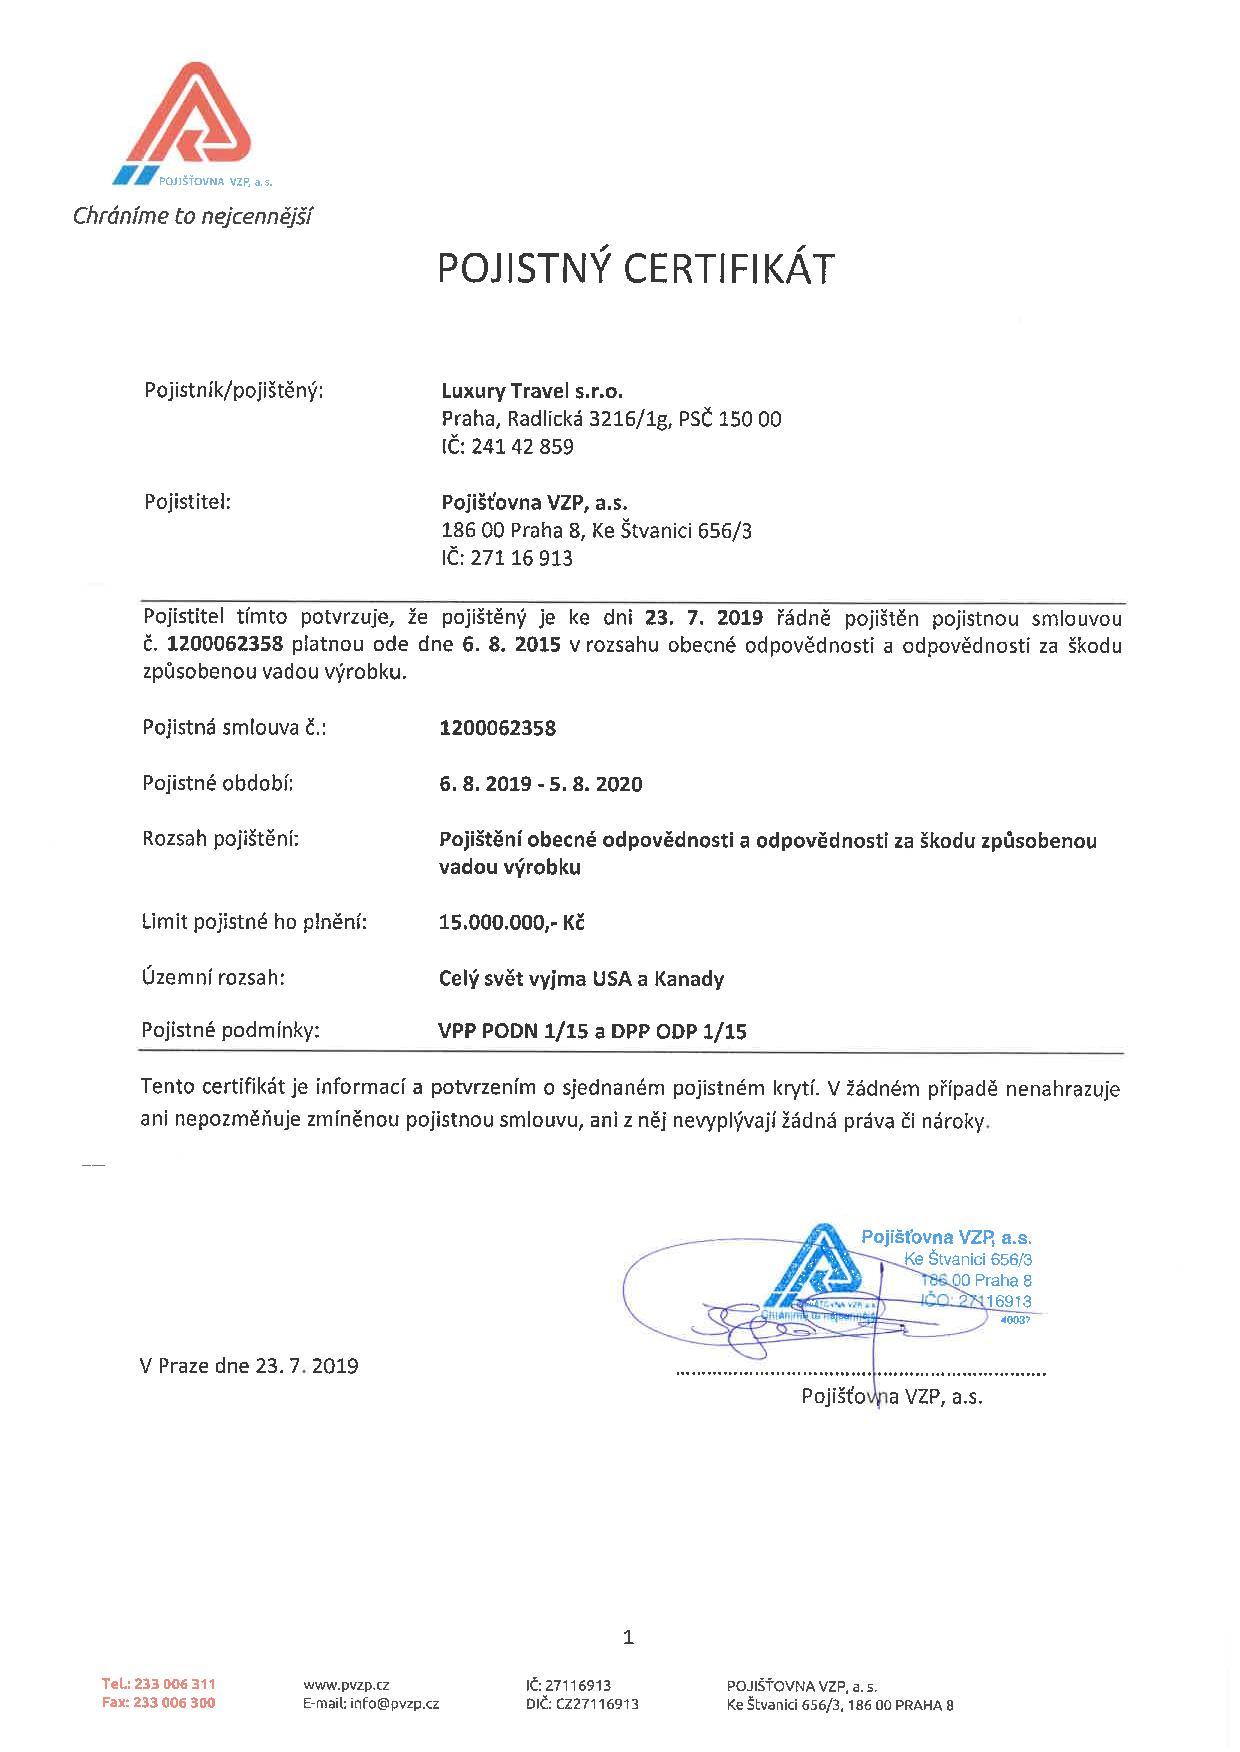 Luxury Travel - certifikát 2019